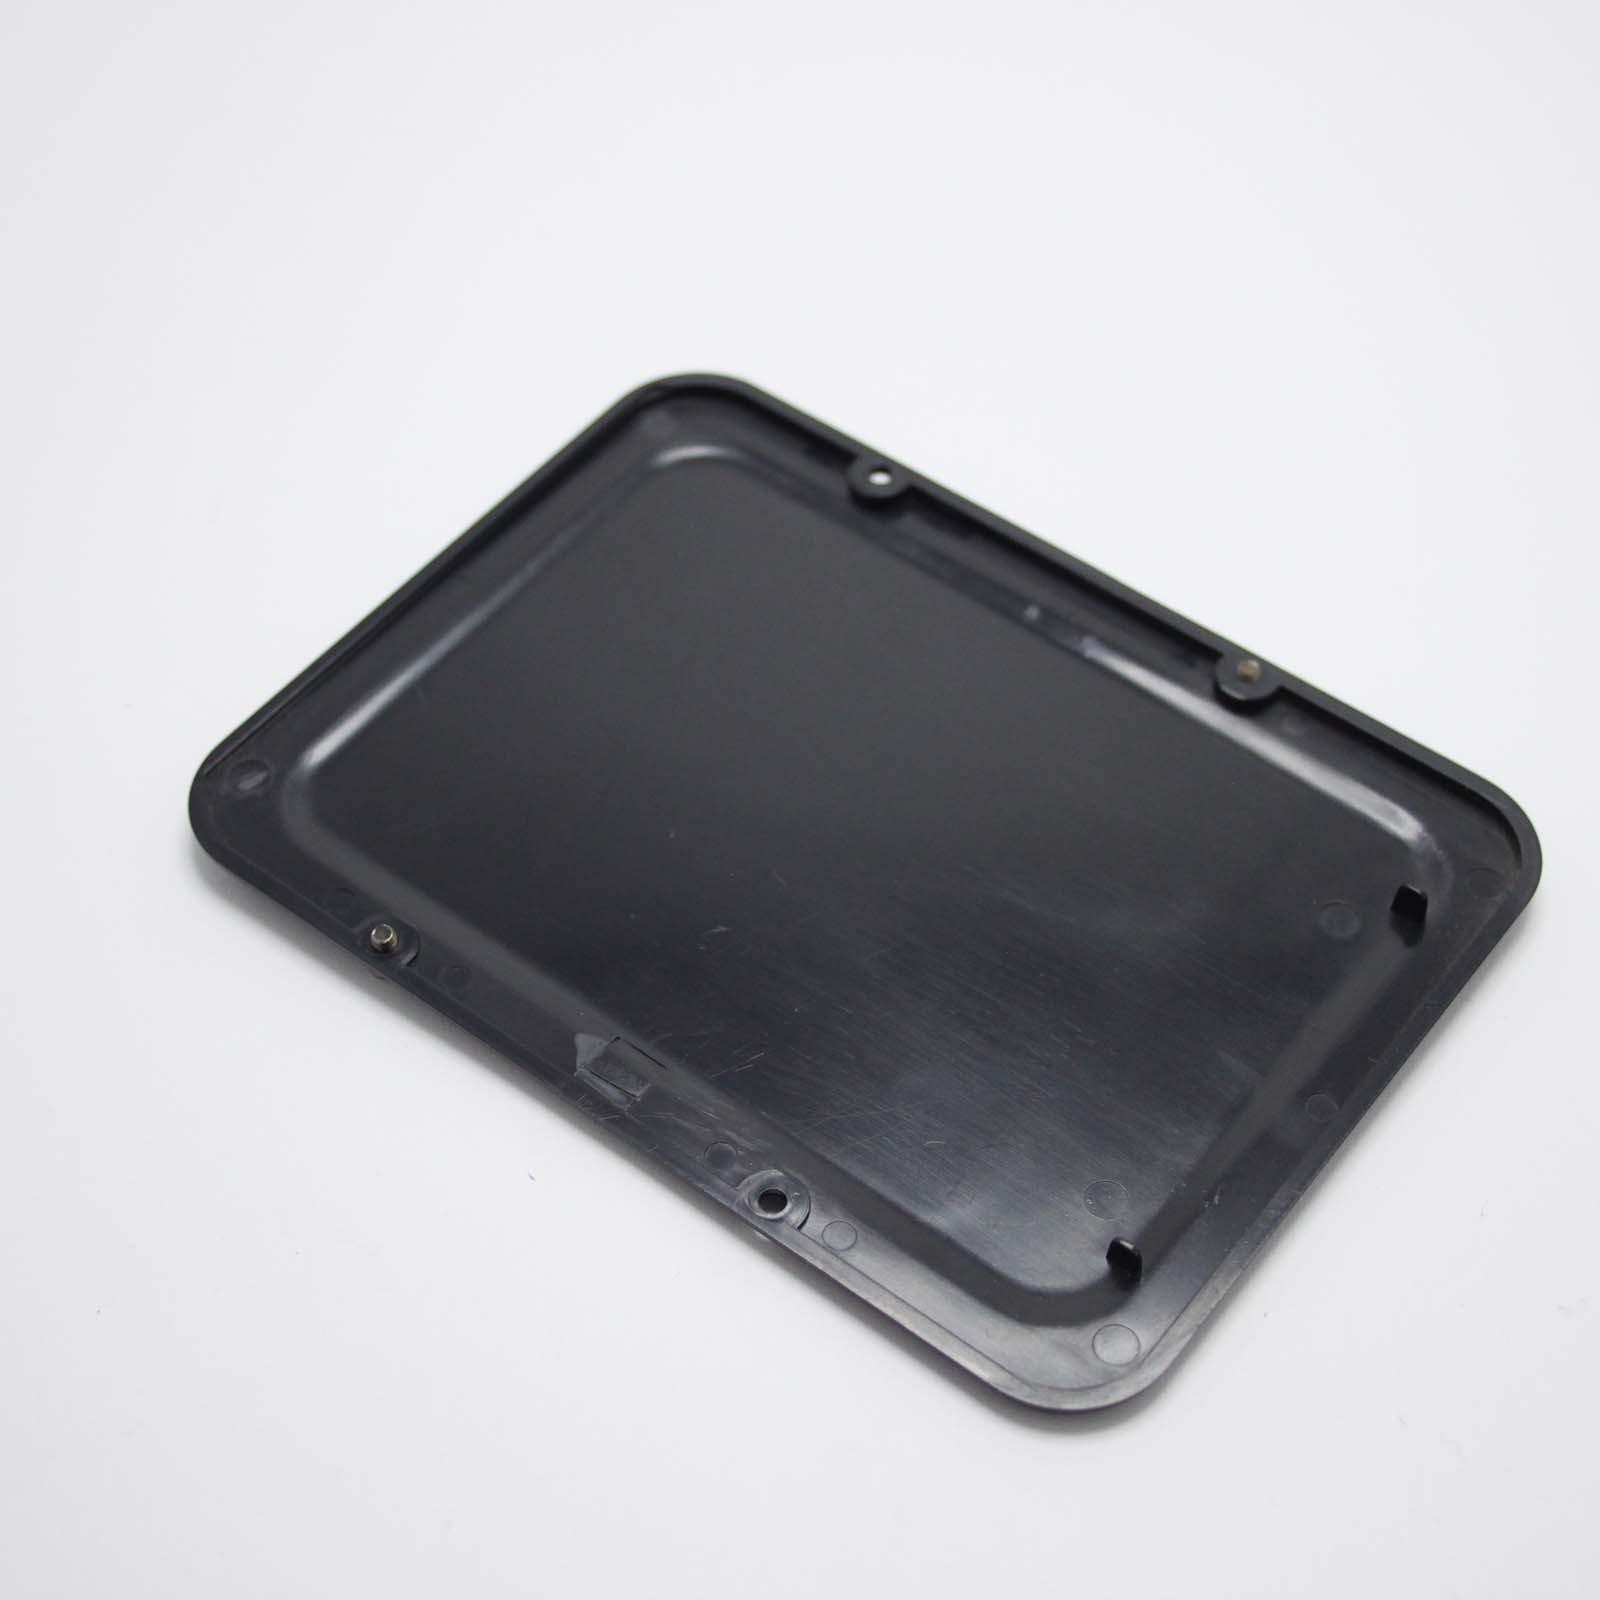 Spertellino WiFi HP Pavilion ZD7000 Tappo scocca posteriore Har disk RAM